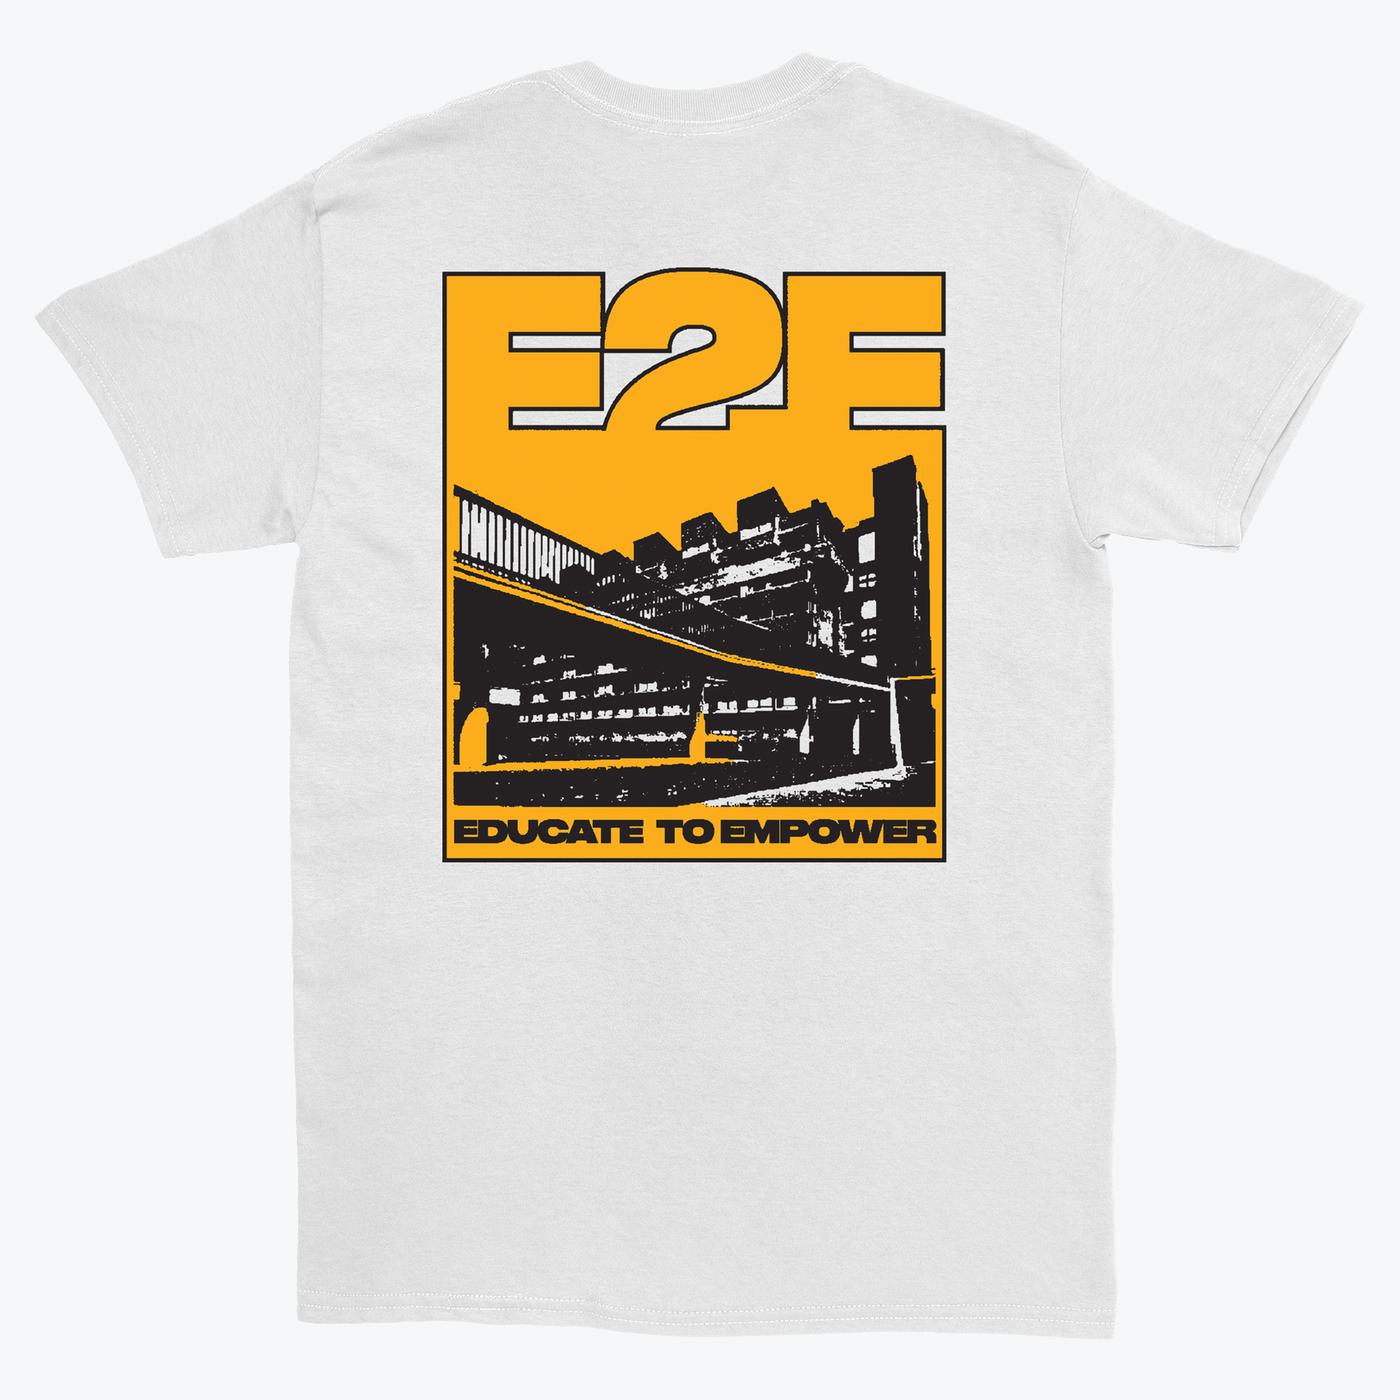 The IMC x YUAF T-Shirt